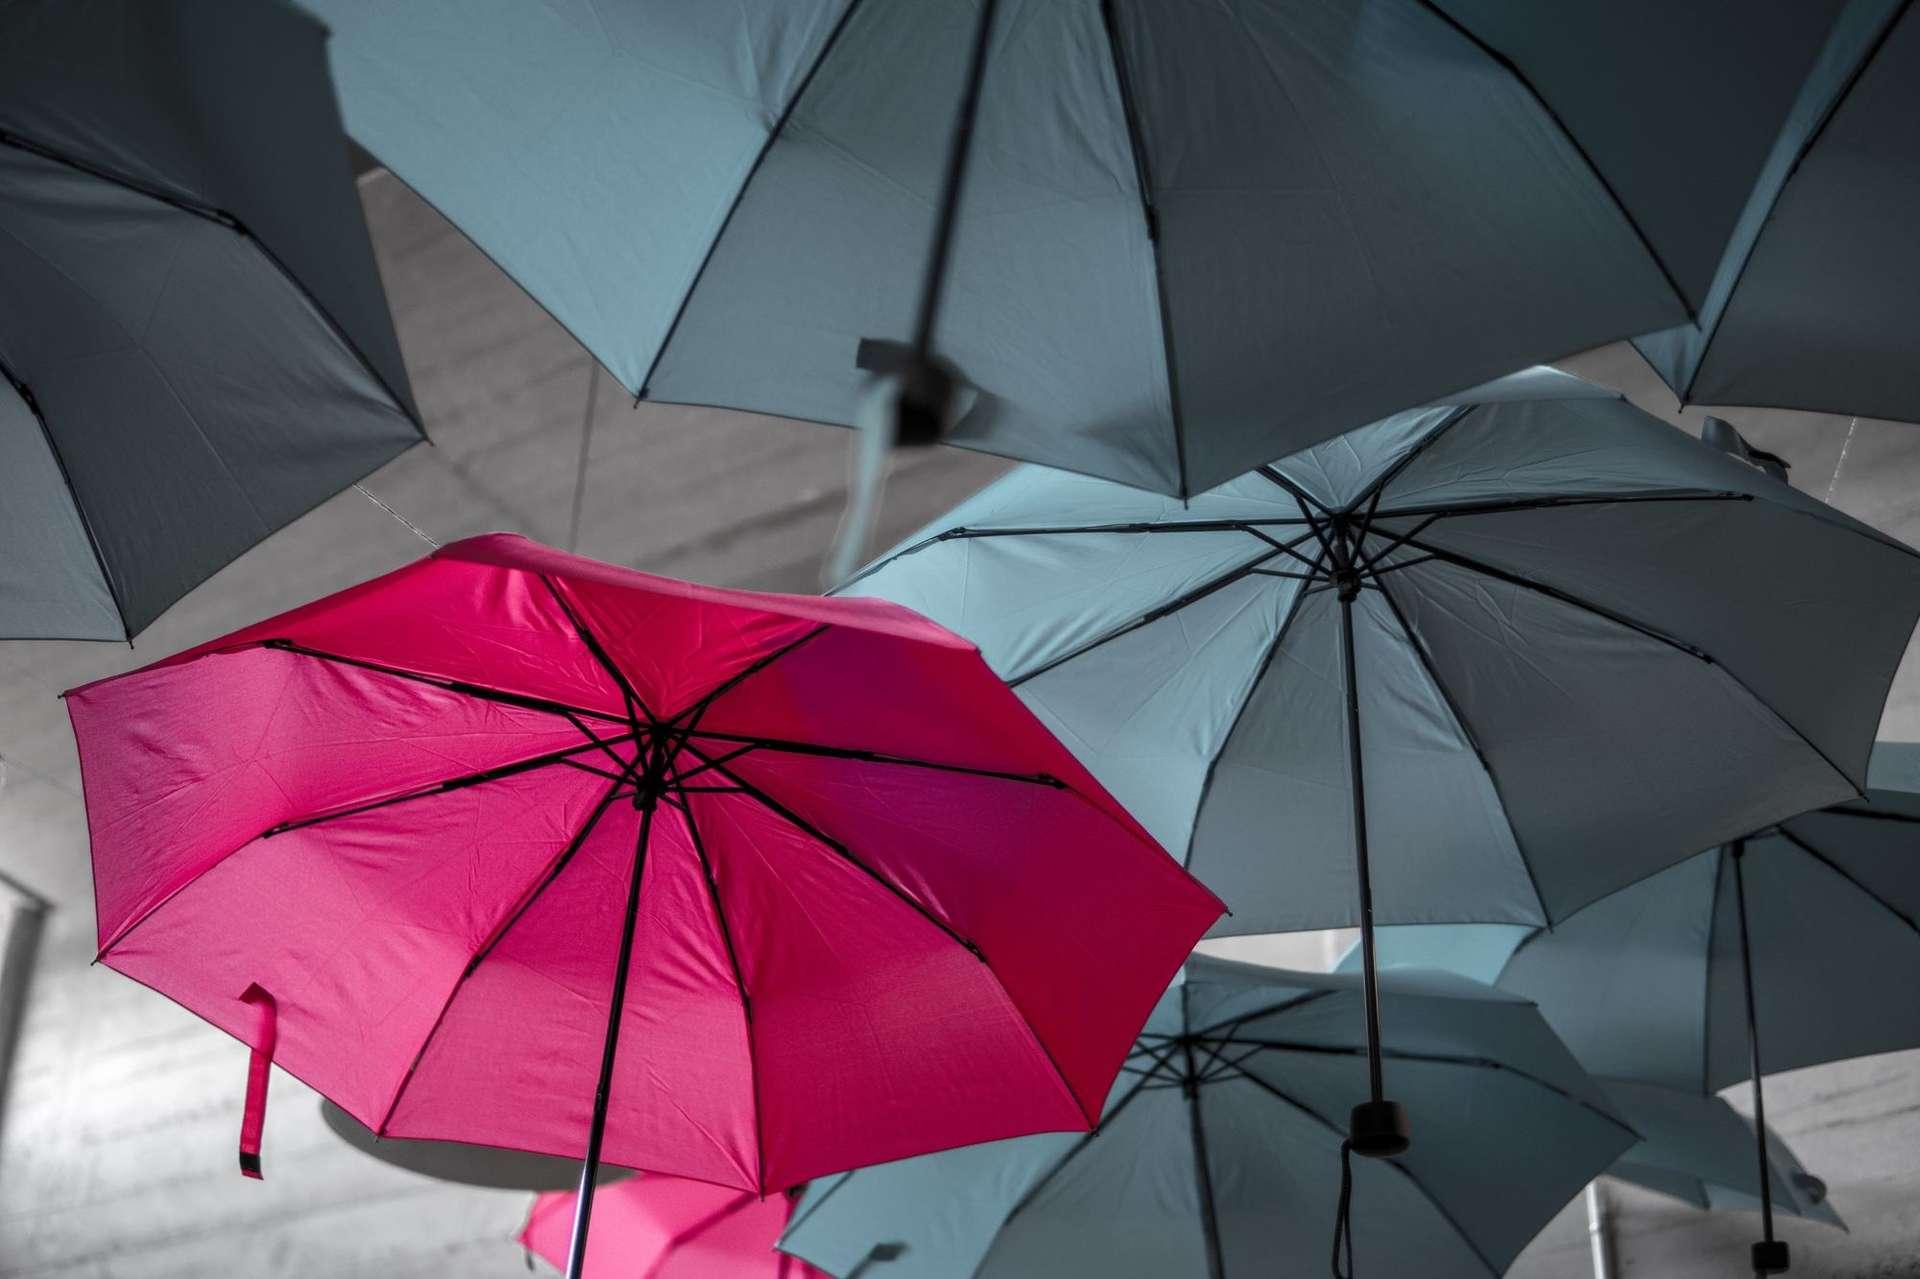 Grey umbrellas and one red umbrella